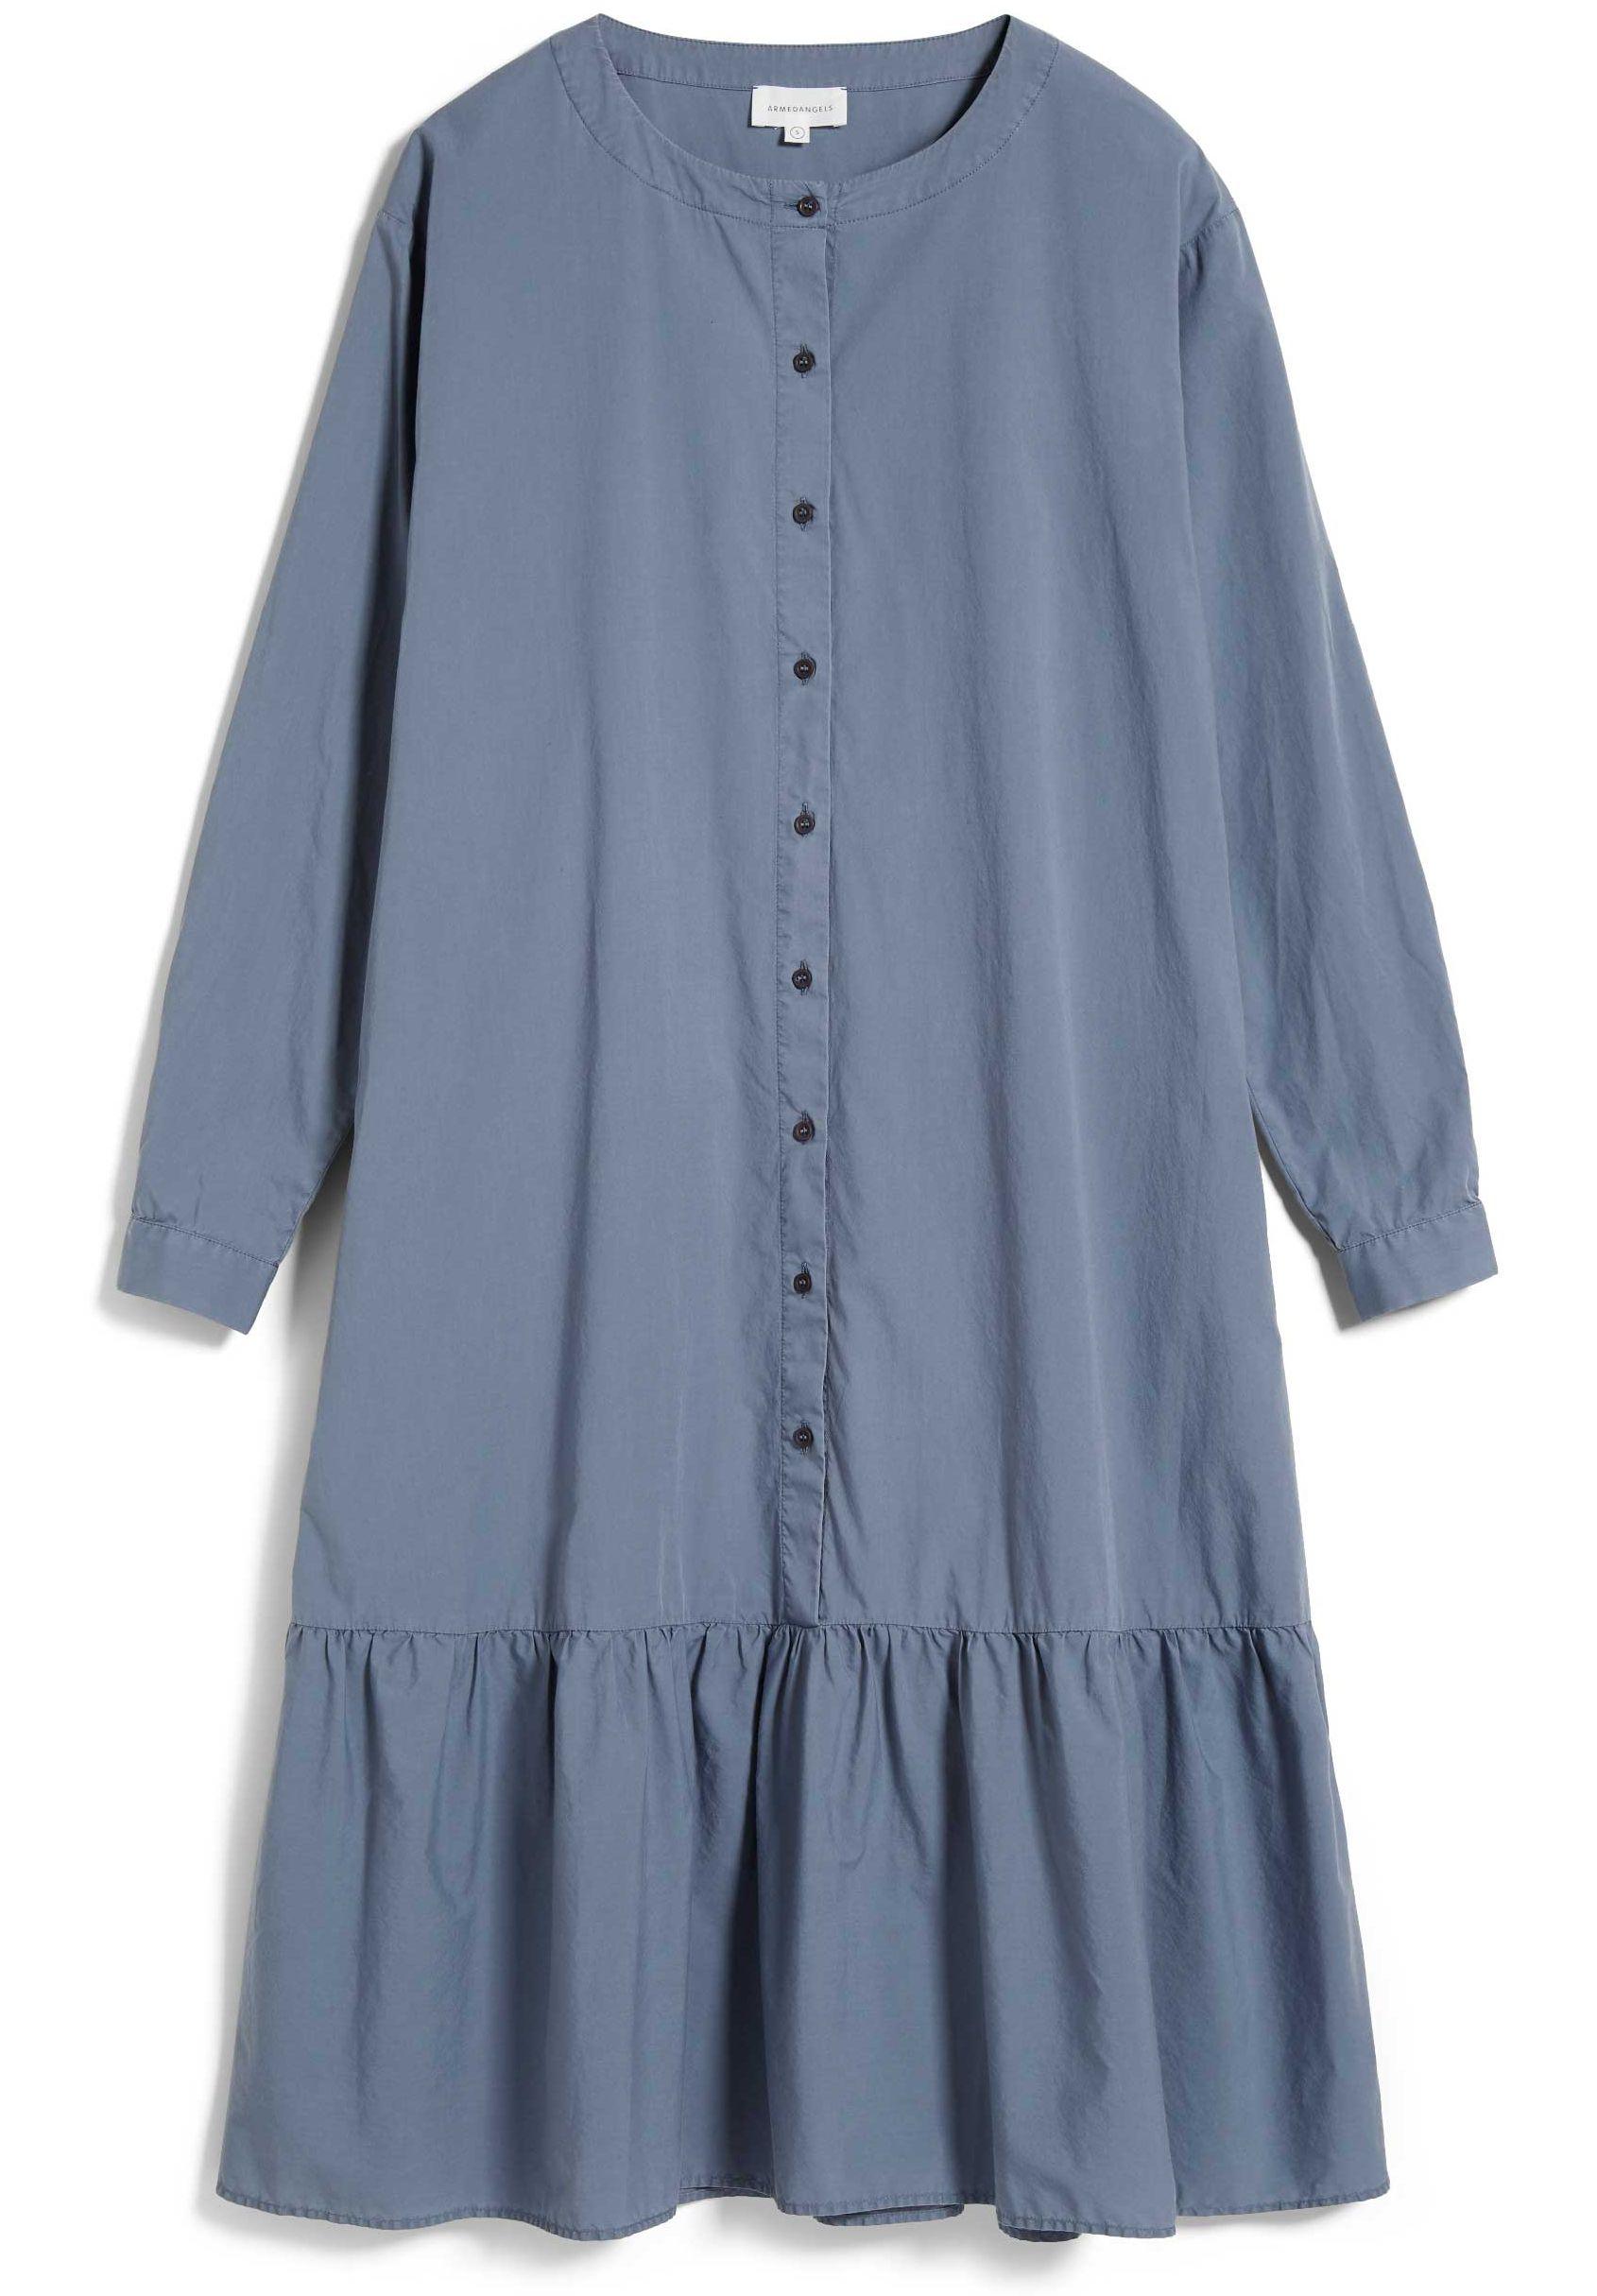 Damen-Kleid MIHAELAA EARTHCOLORS natural indigo